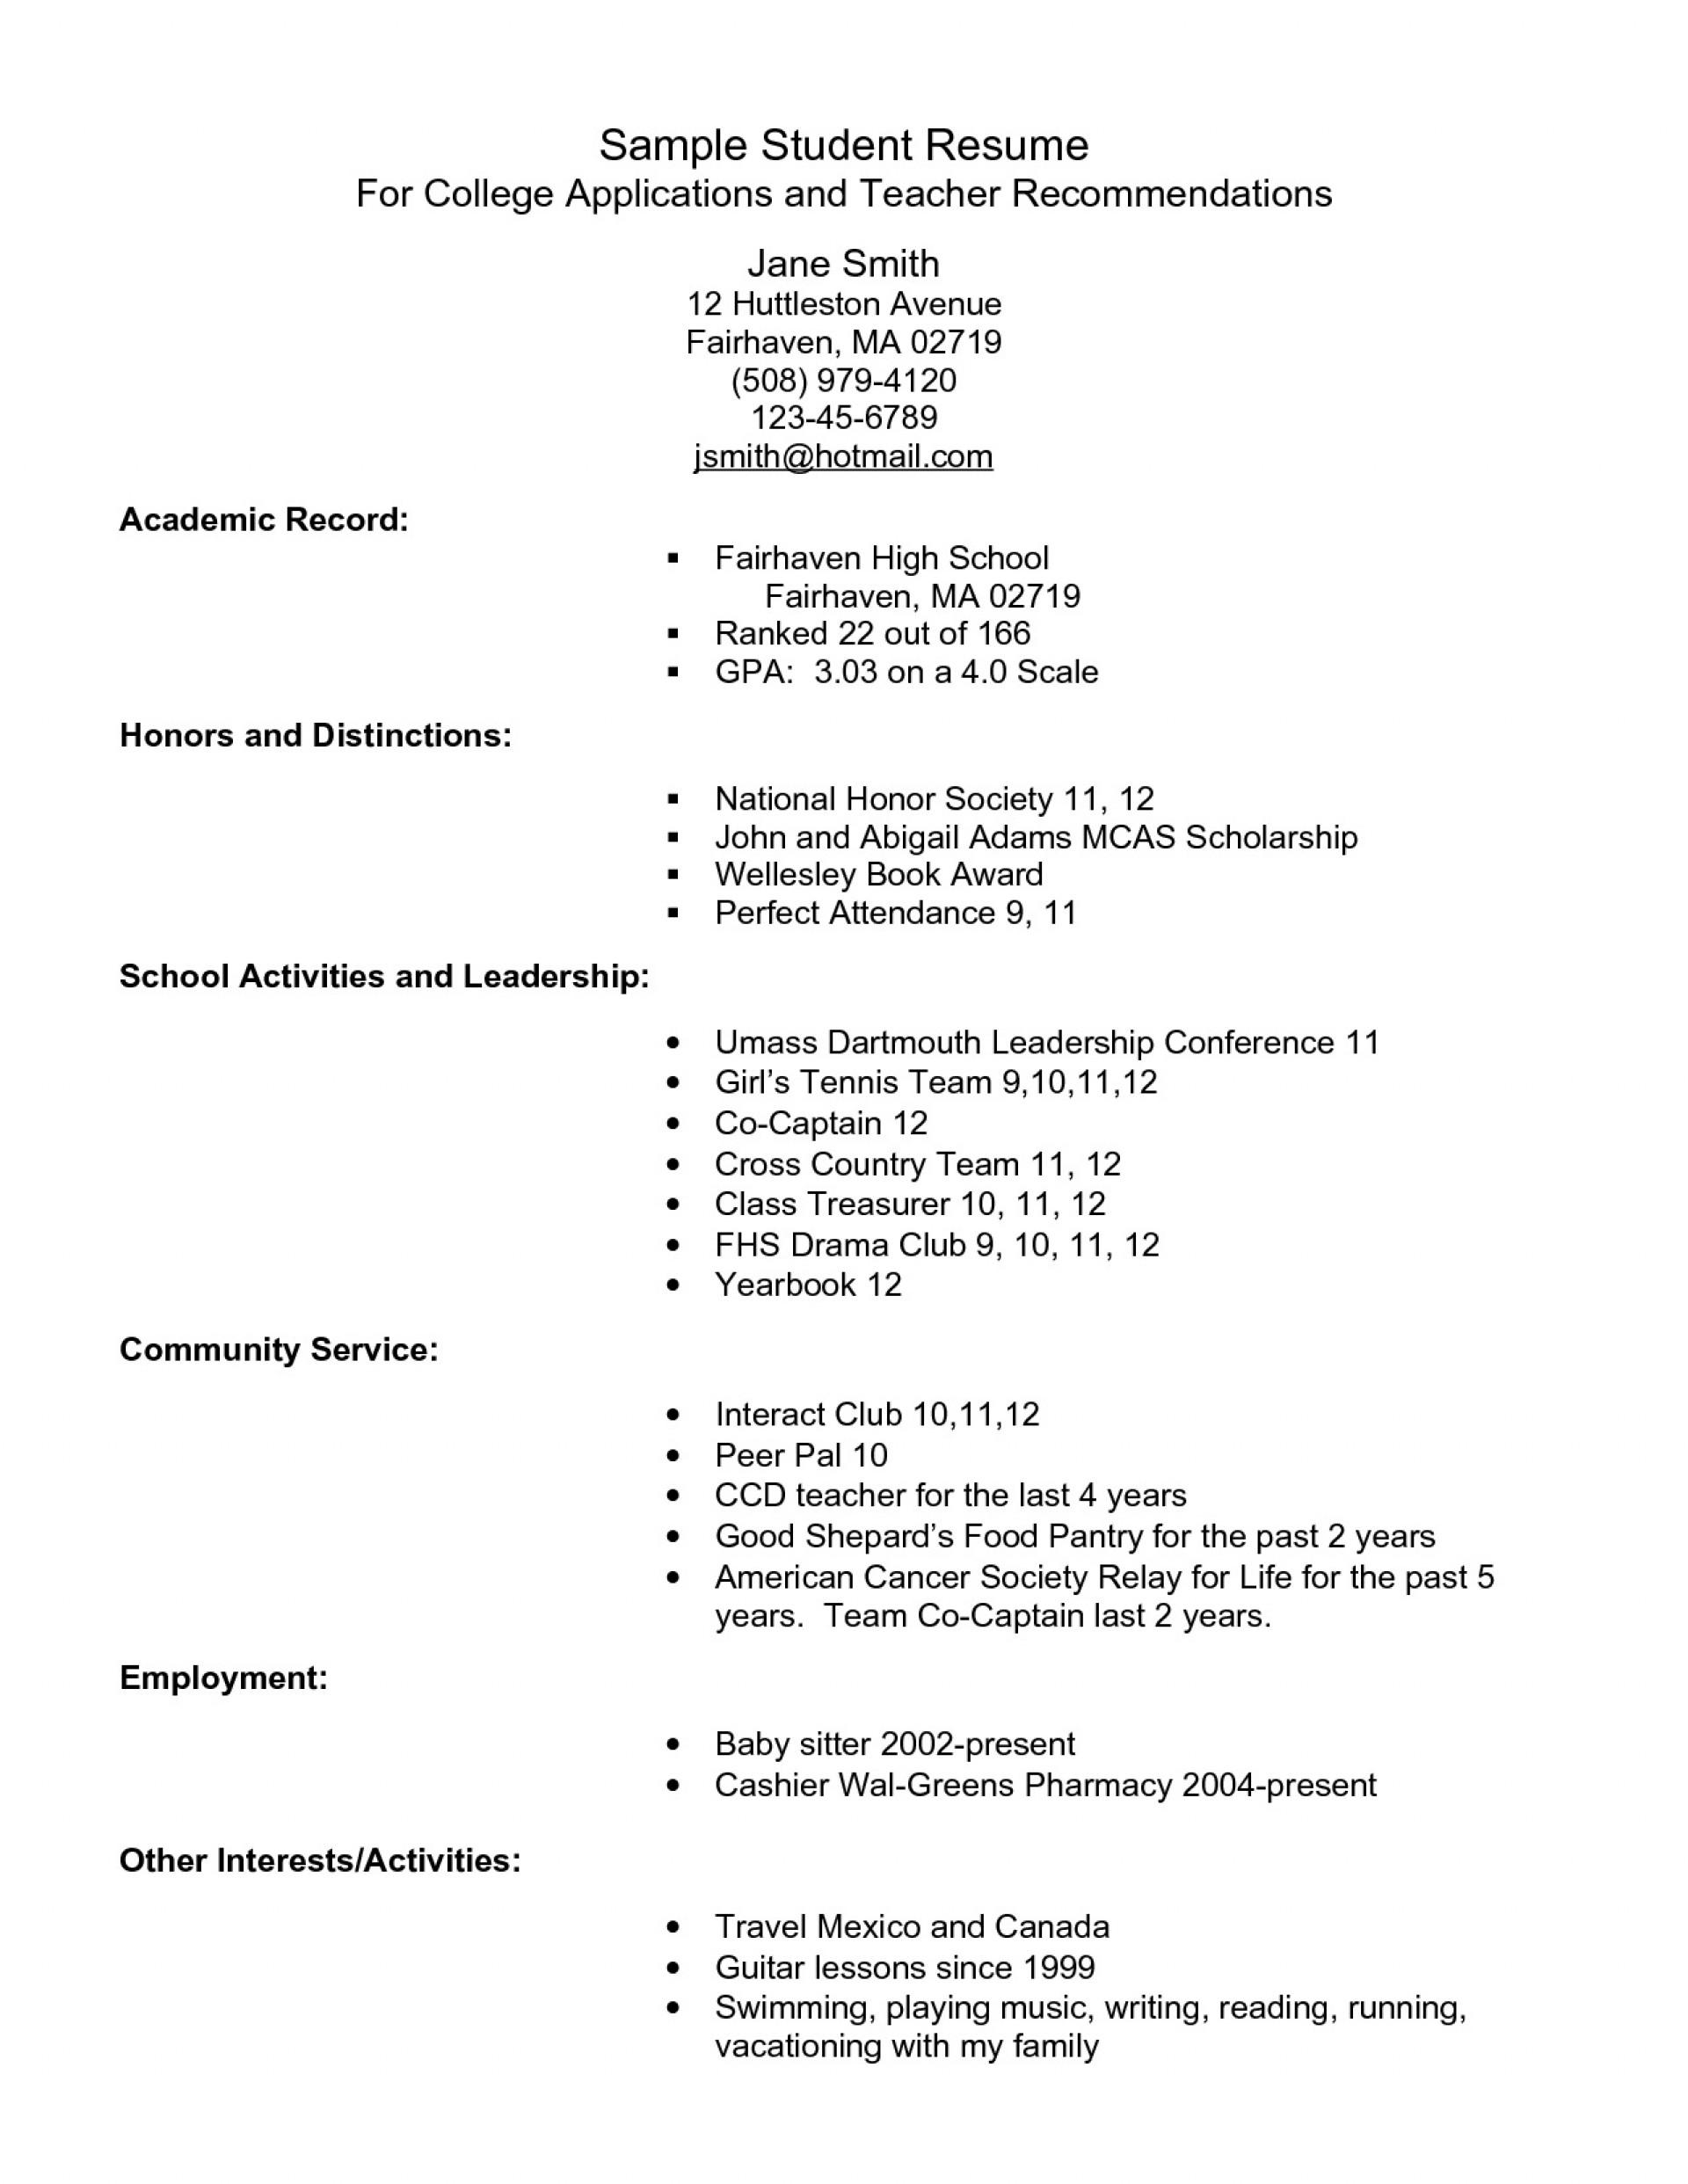 004 Impressive College Admission Resume Template Photo  Templates App Sample Application Microsoft Word1920